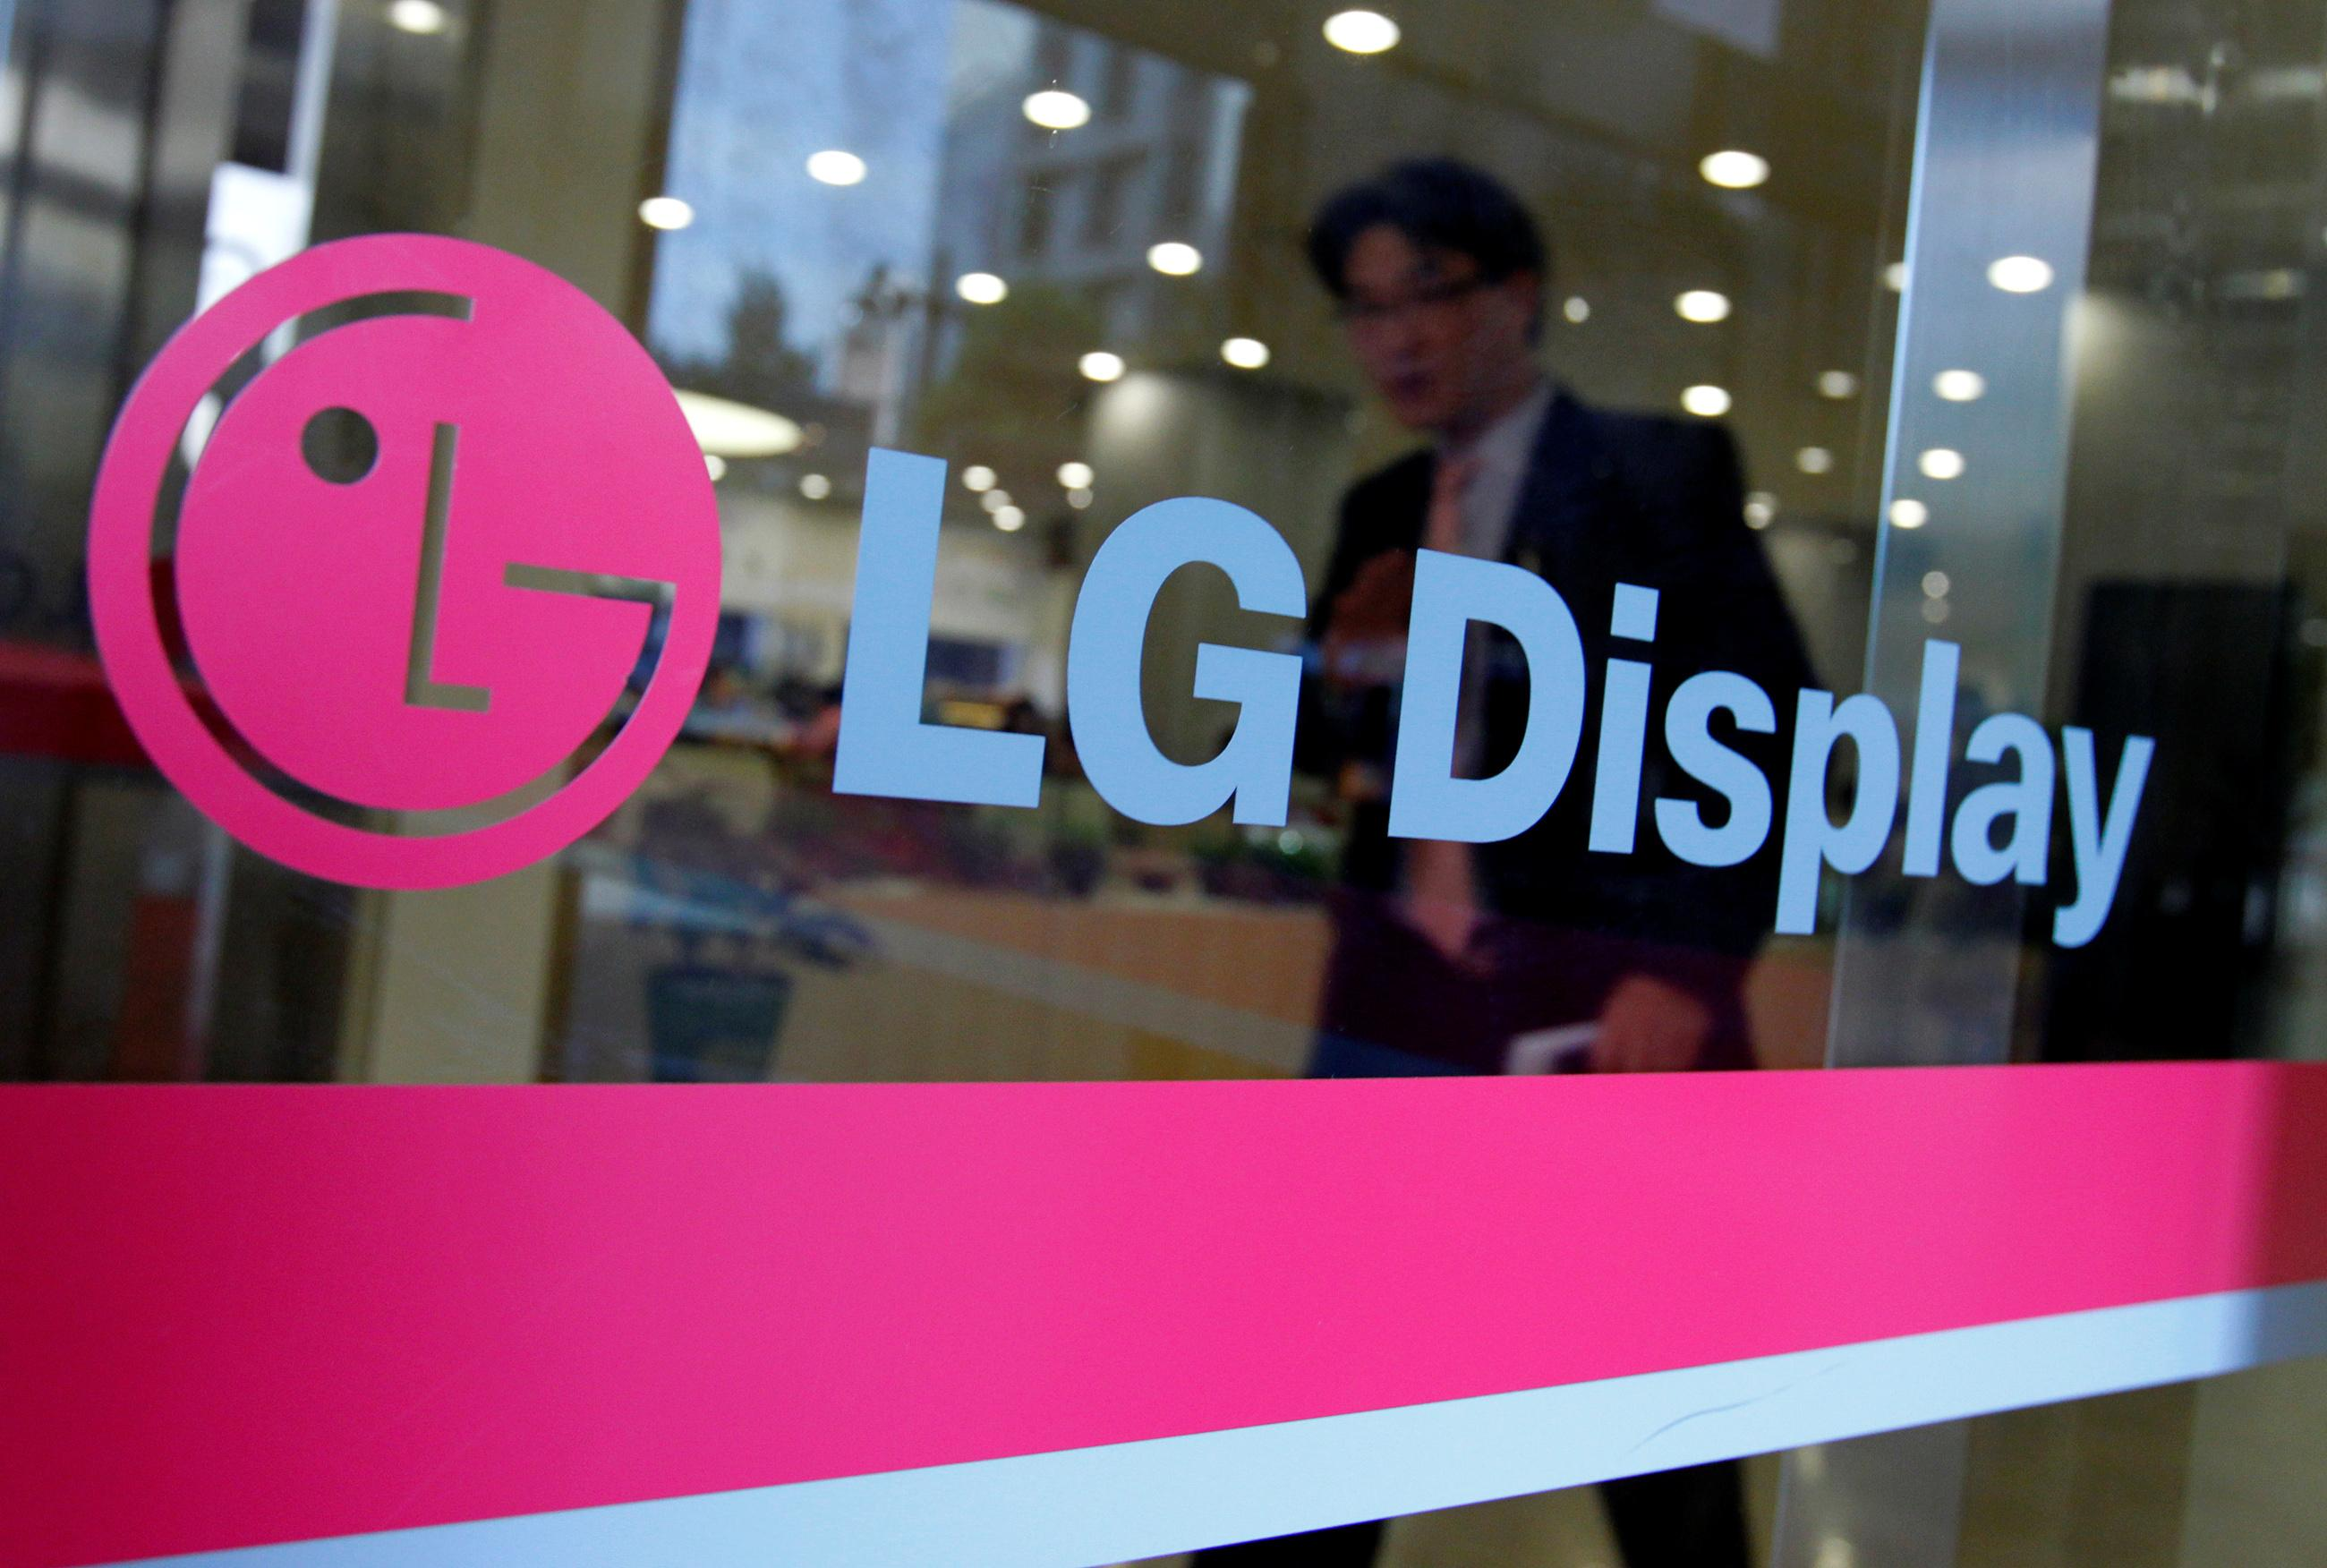 LG Display to launch voluntary redundancy program amid losses